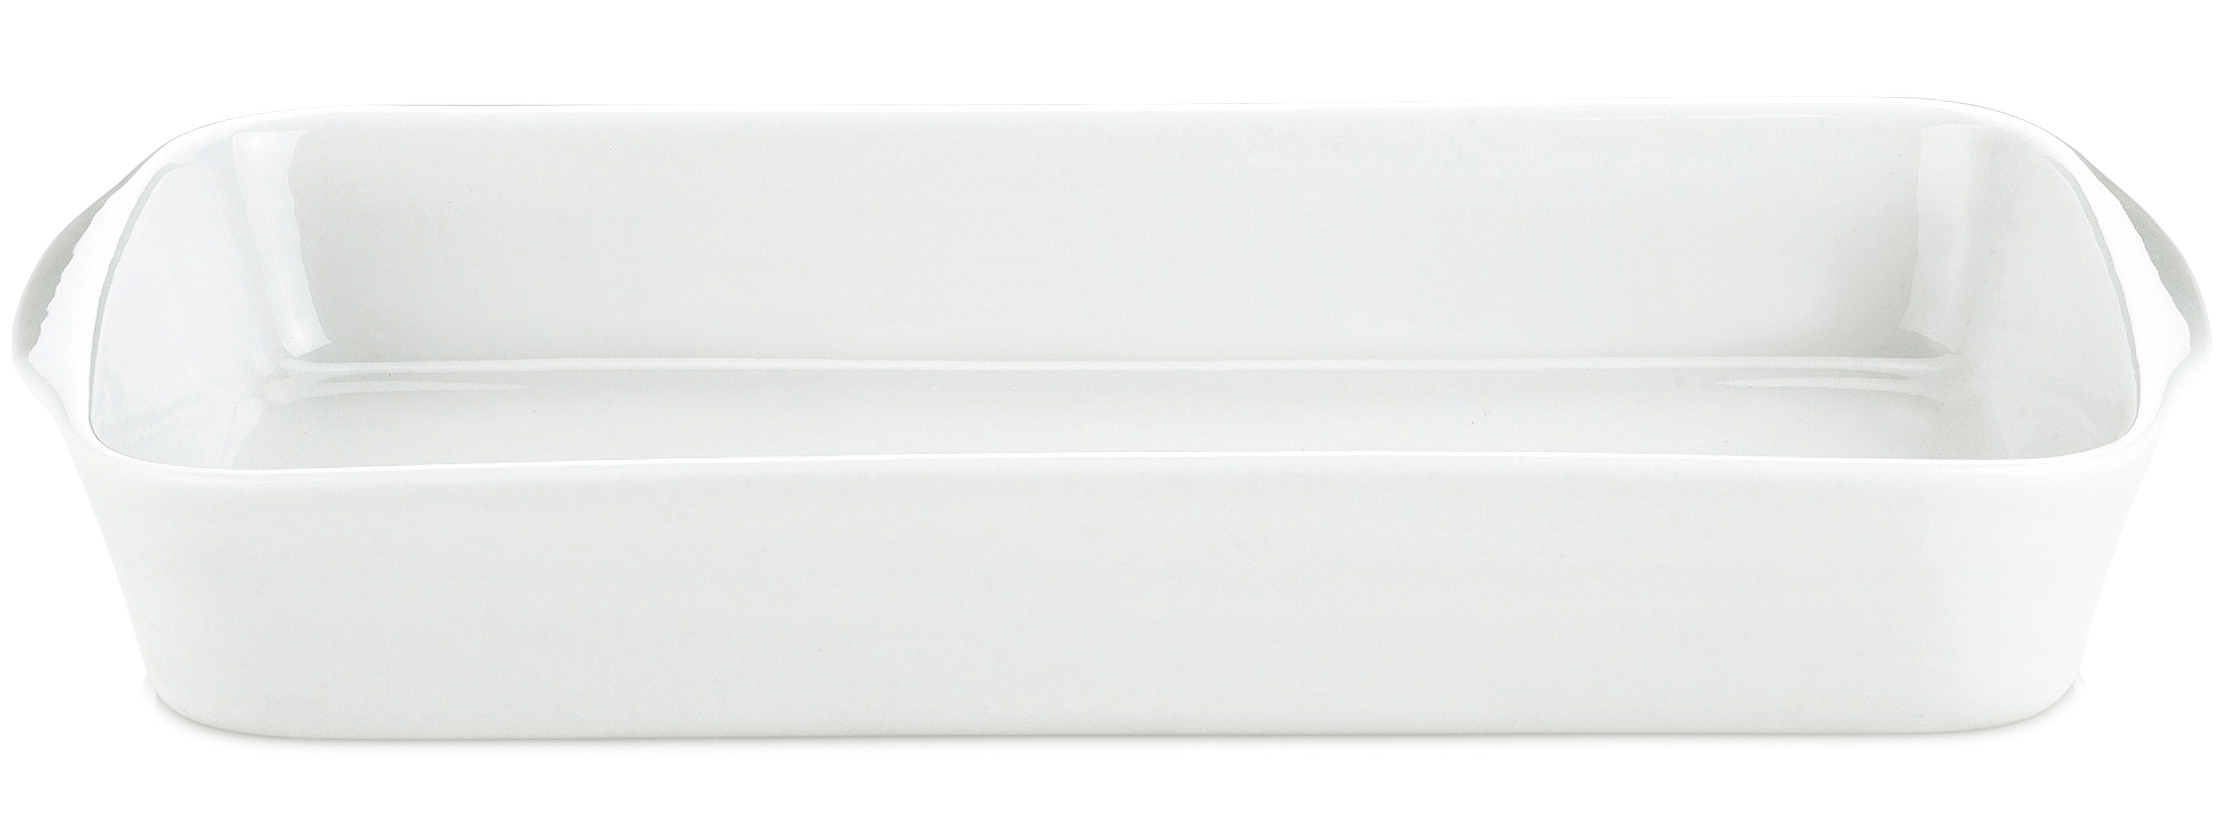 Pillivuyt Gastronomi Form Rektangulär 35 x 22 cm